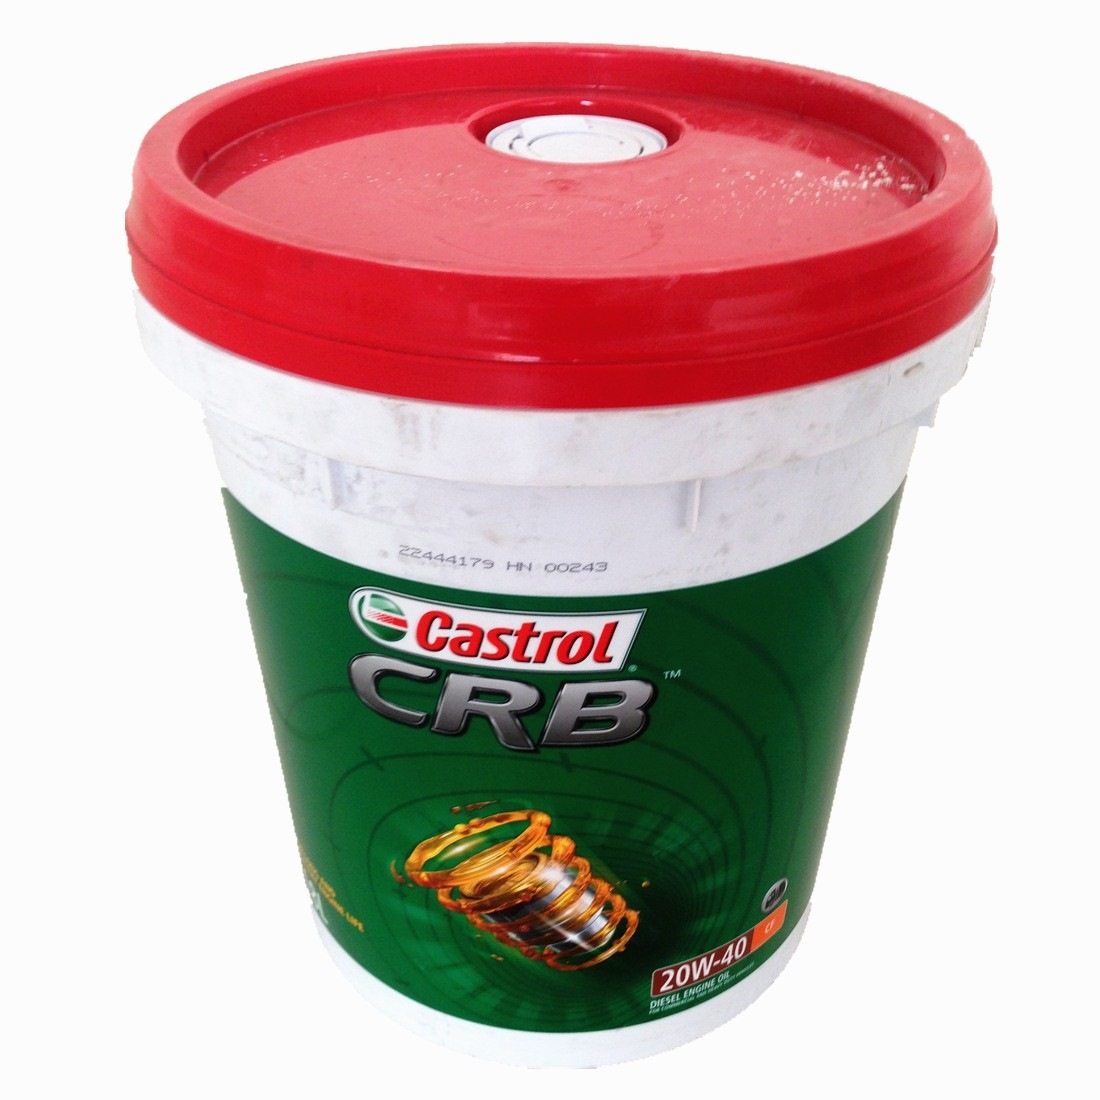 Castrol Engine Oil Crb 20w40 18l Lubricants Oils